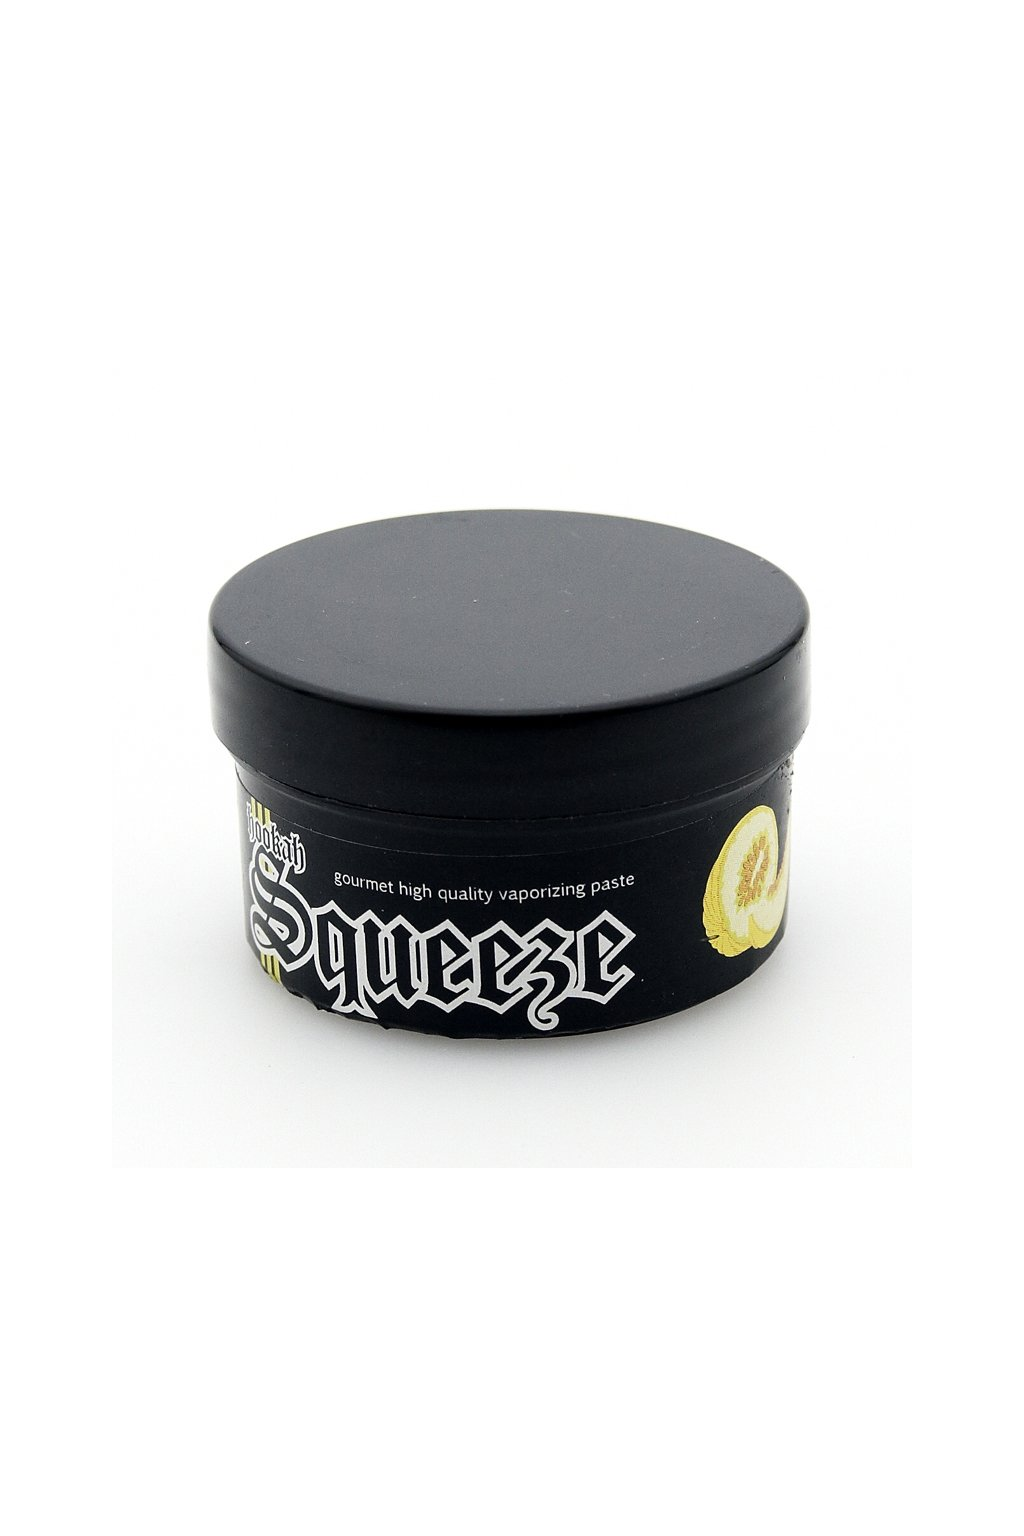 hookahSqueeze Vapor Paste 050 g Sweet Melon